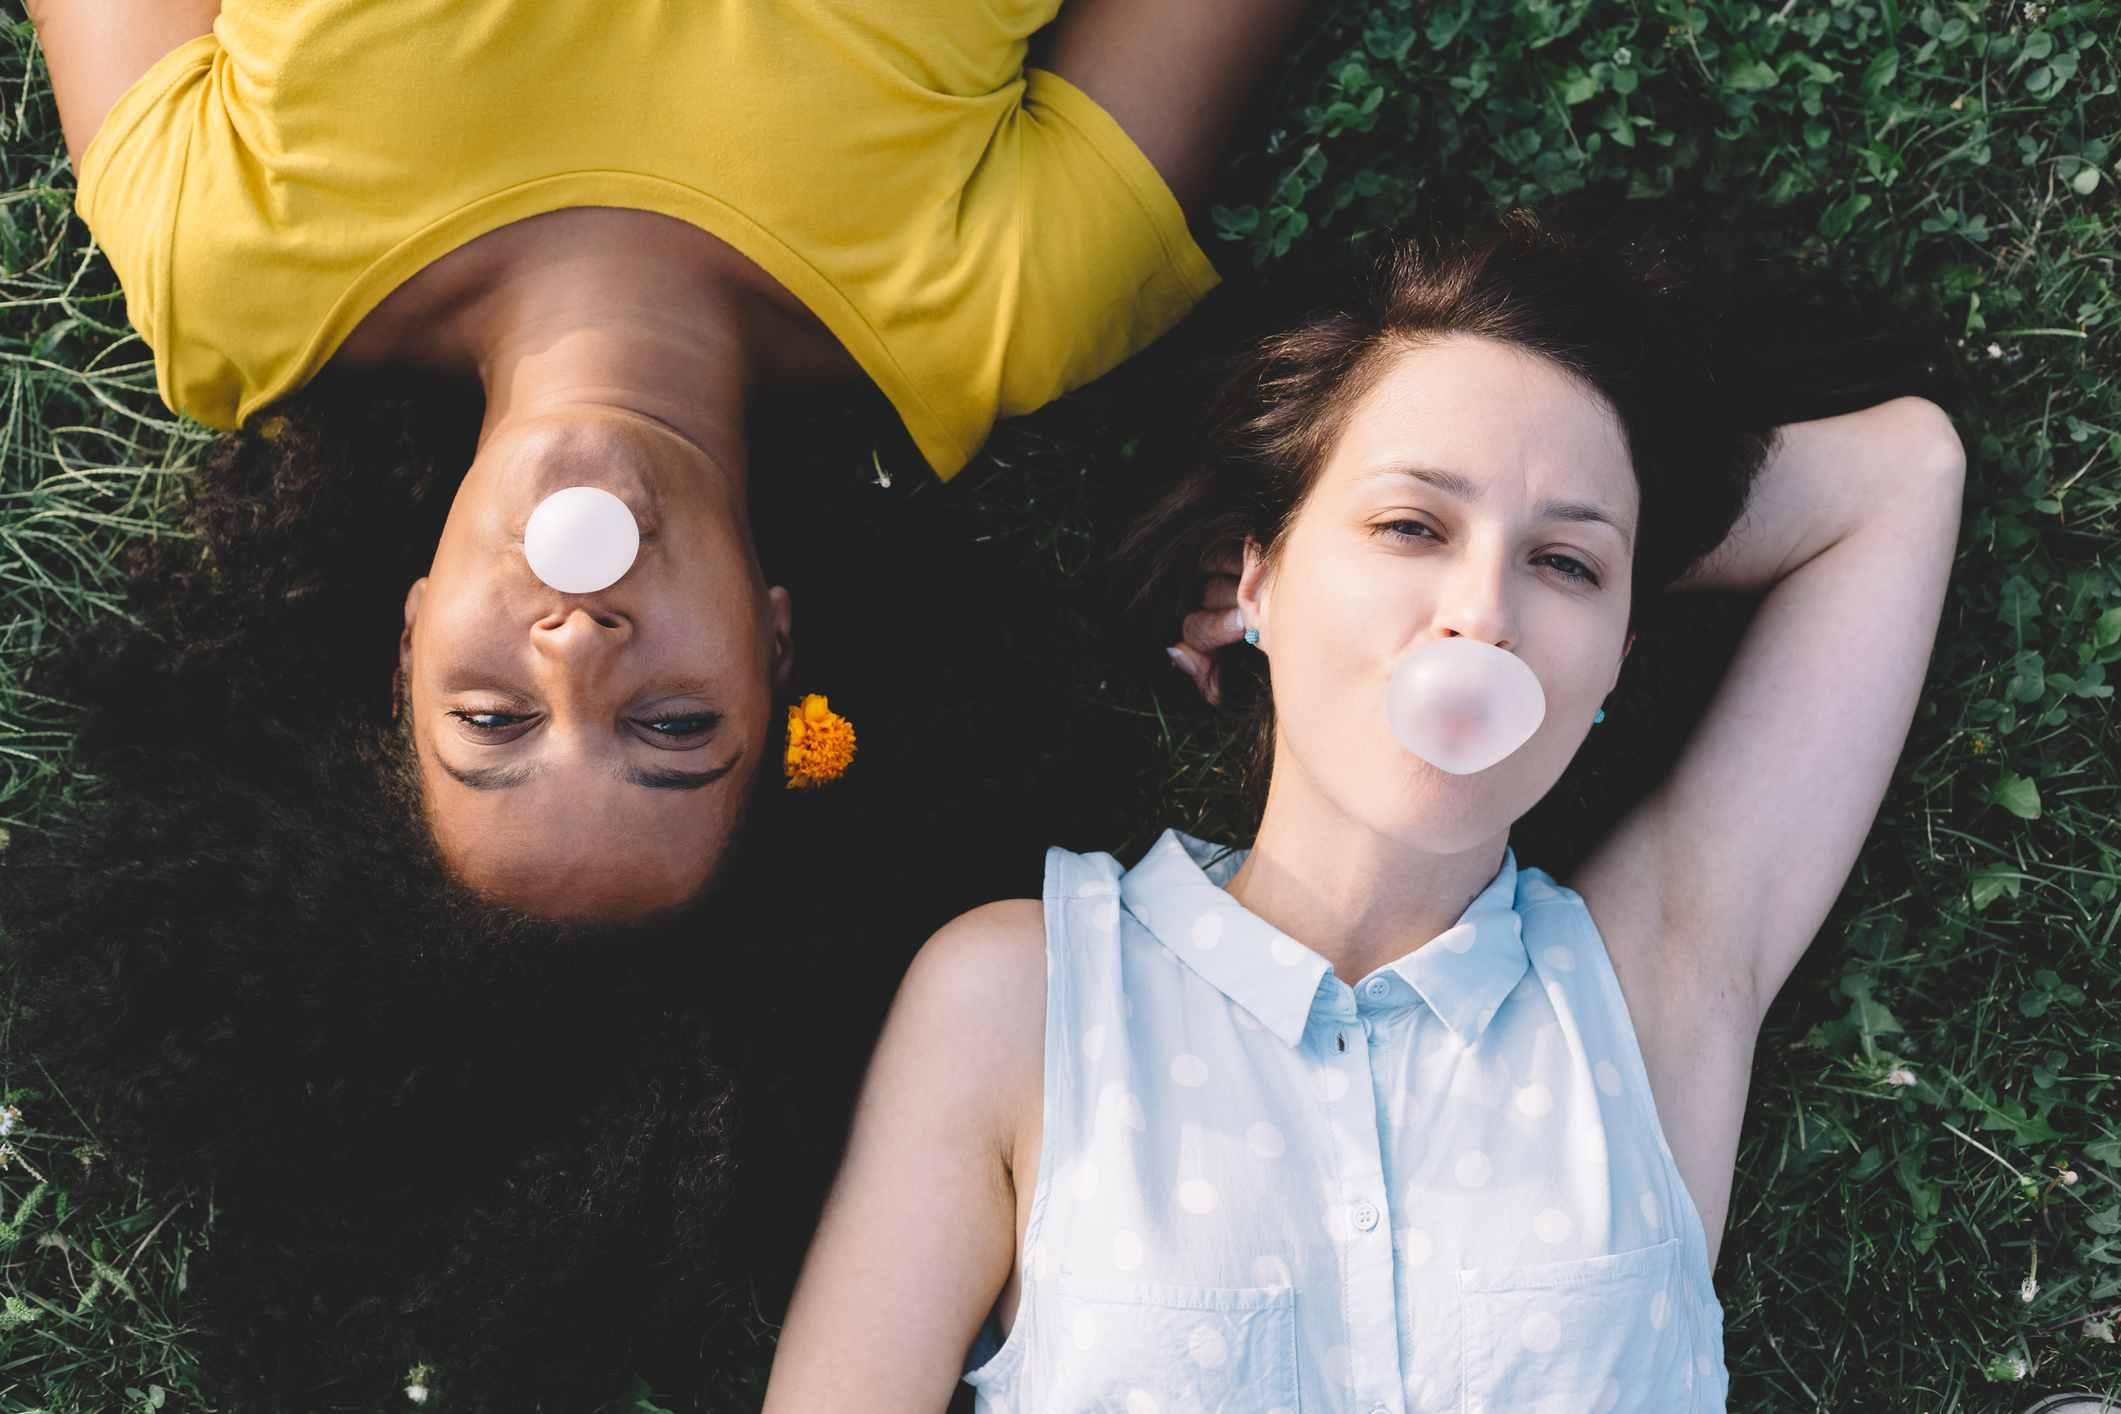 women chewing gum